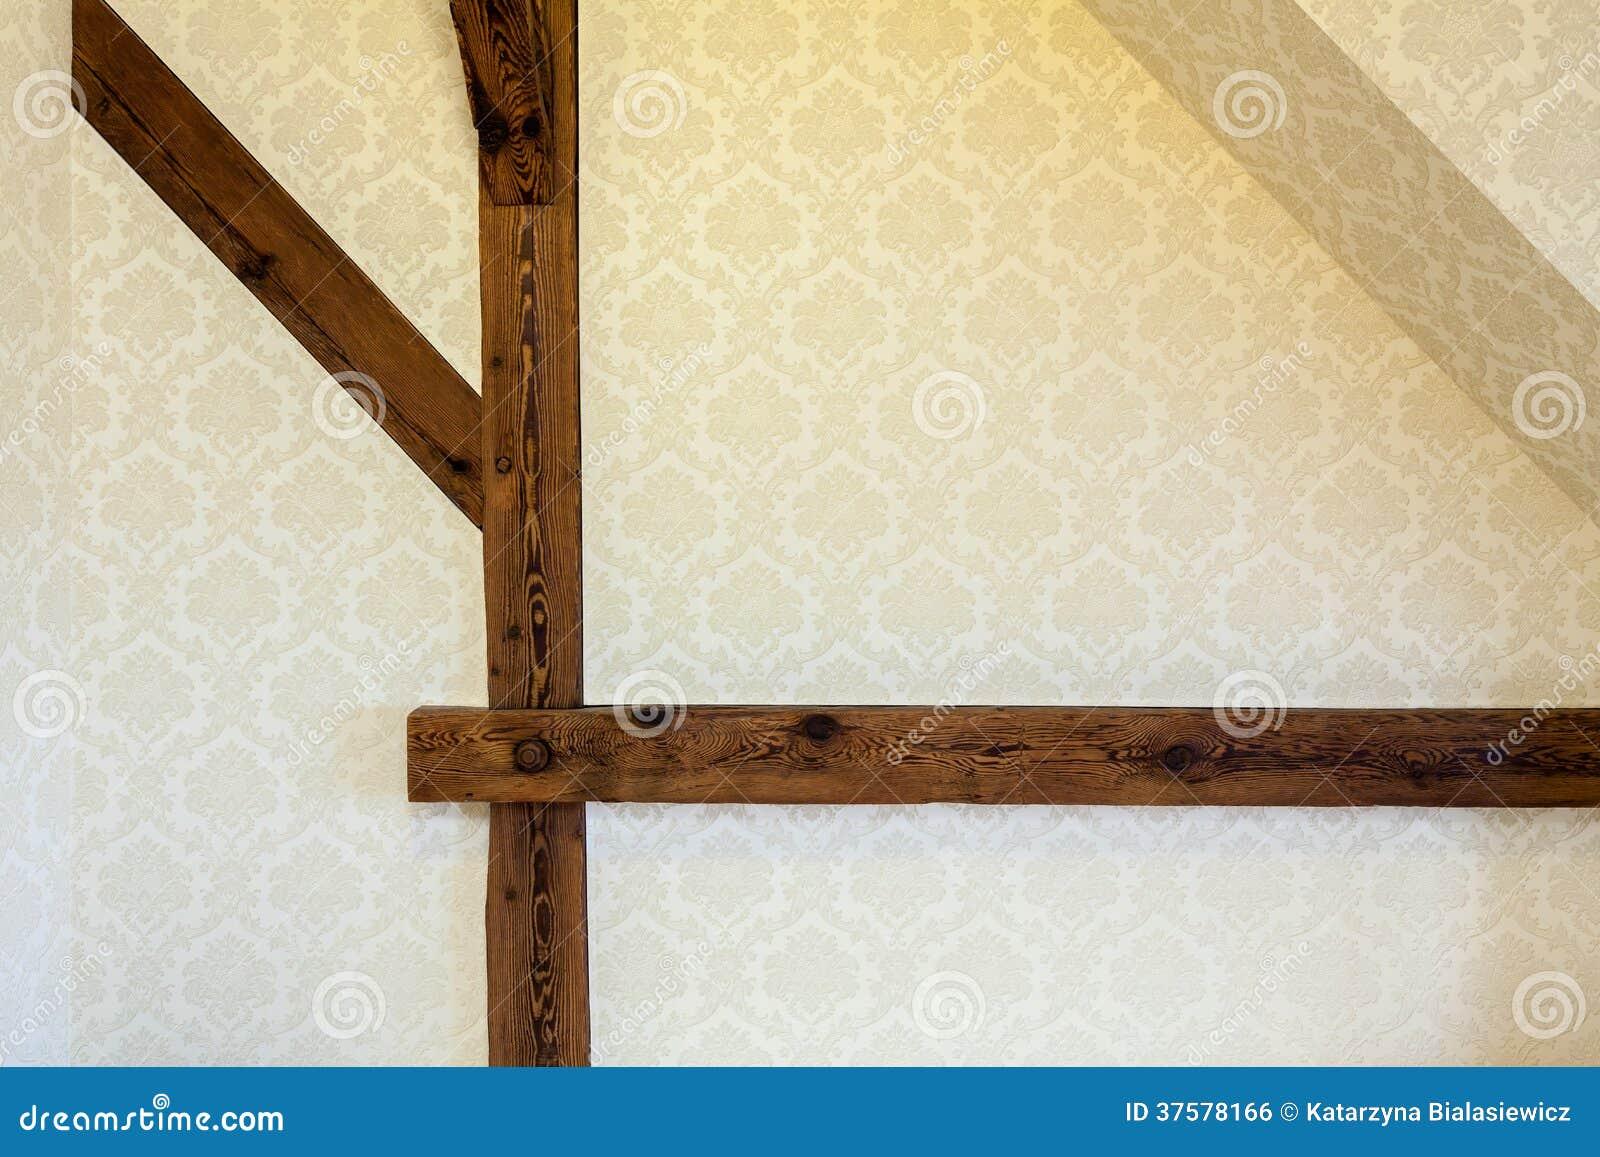 Decorative structural design backgrounds 3d illustration for Decorative structural columns